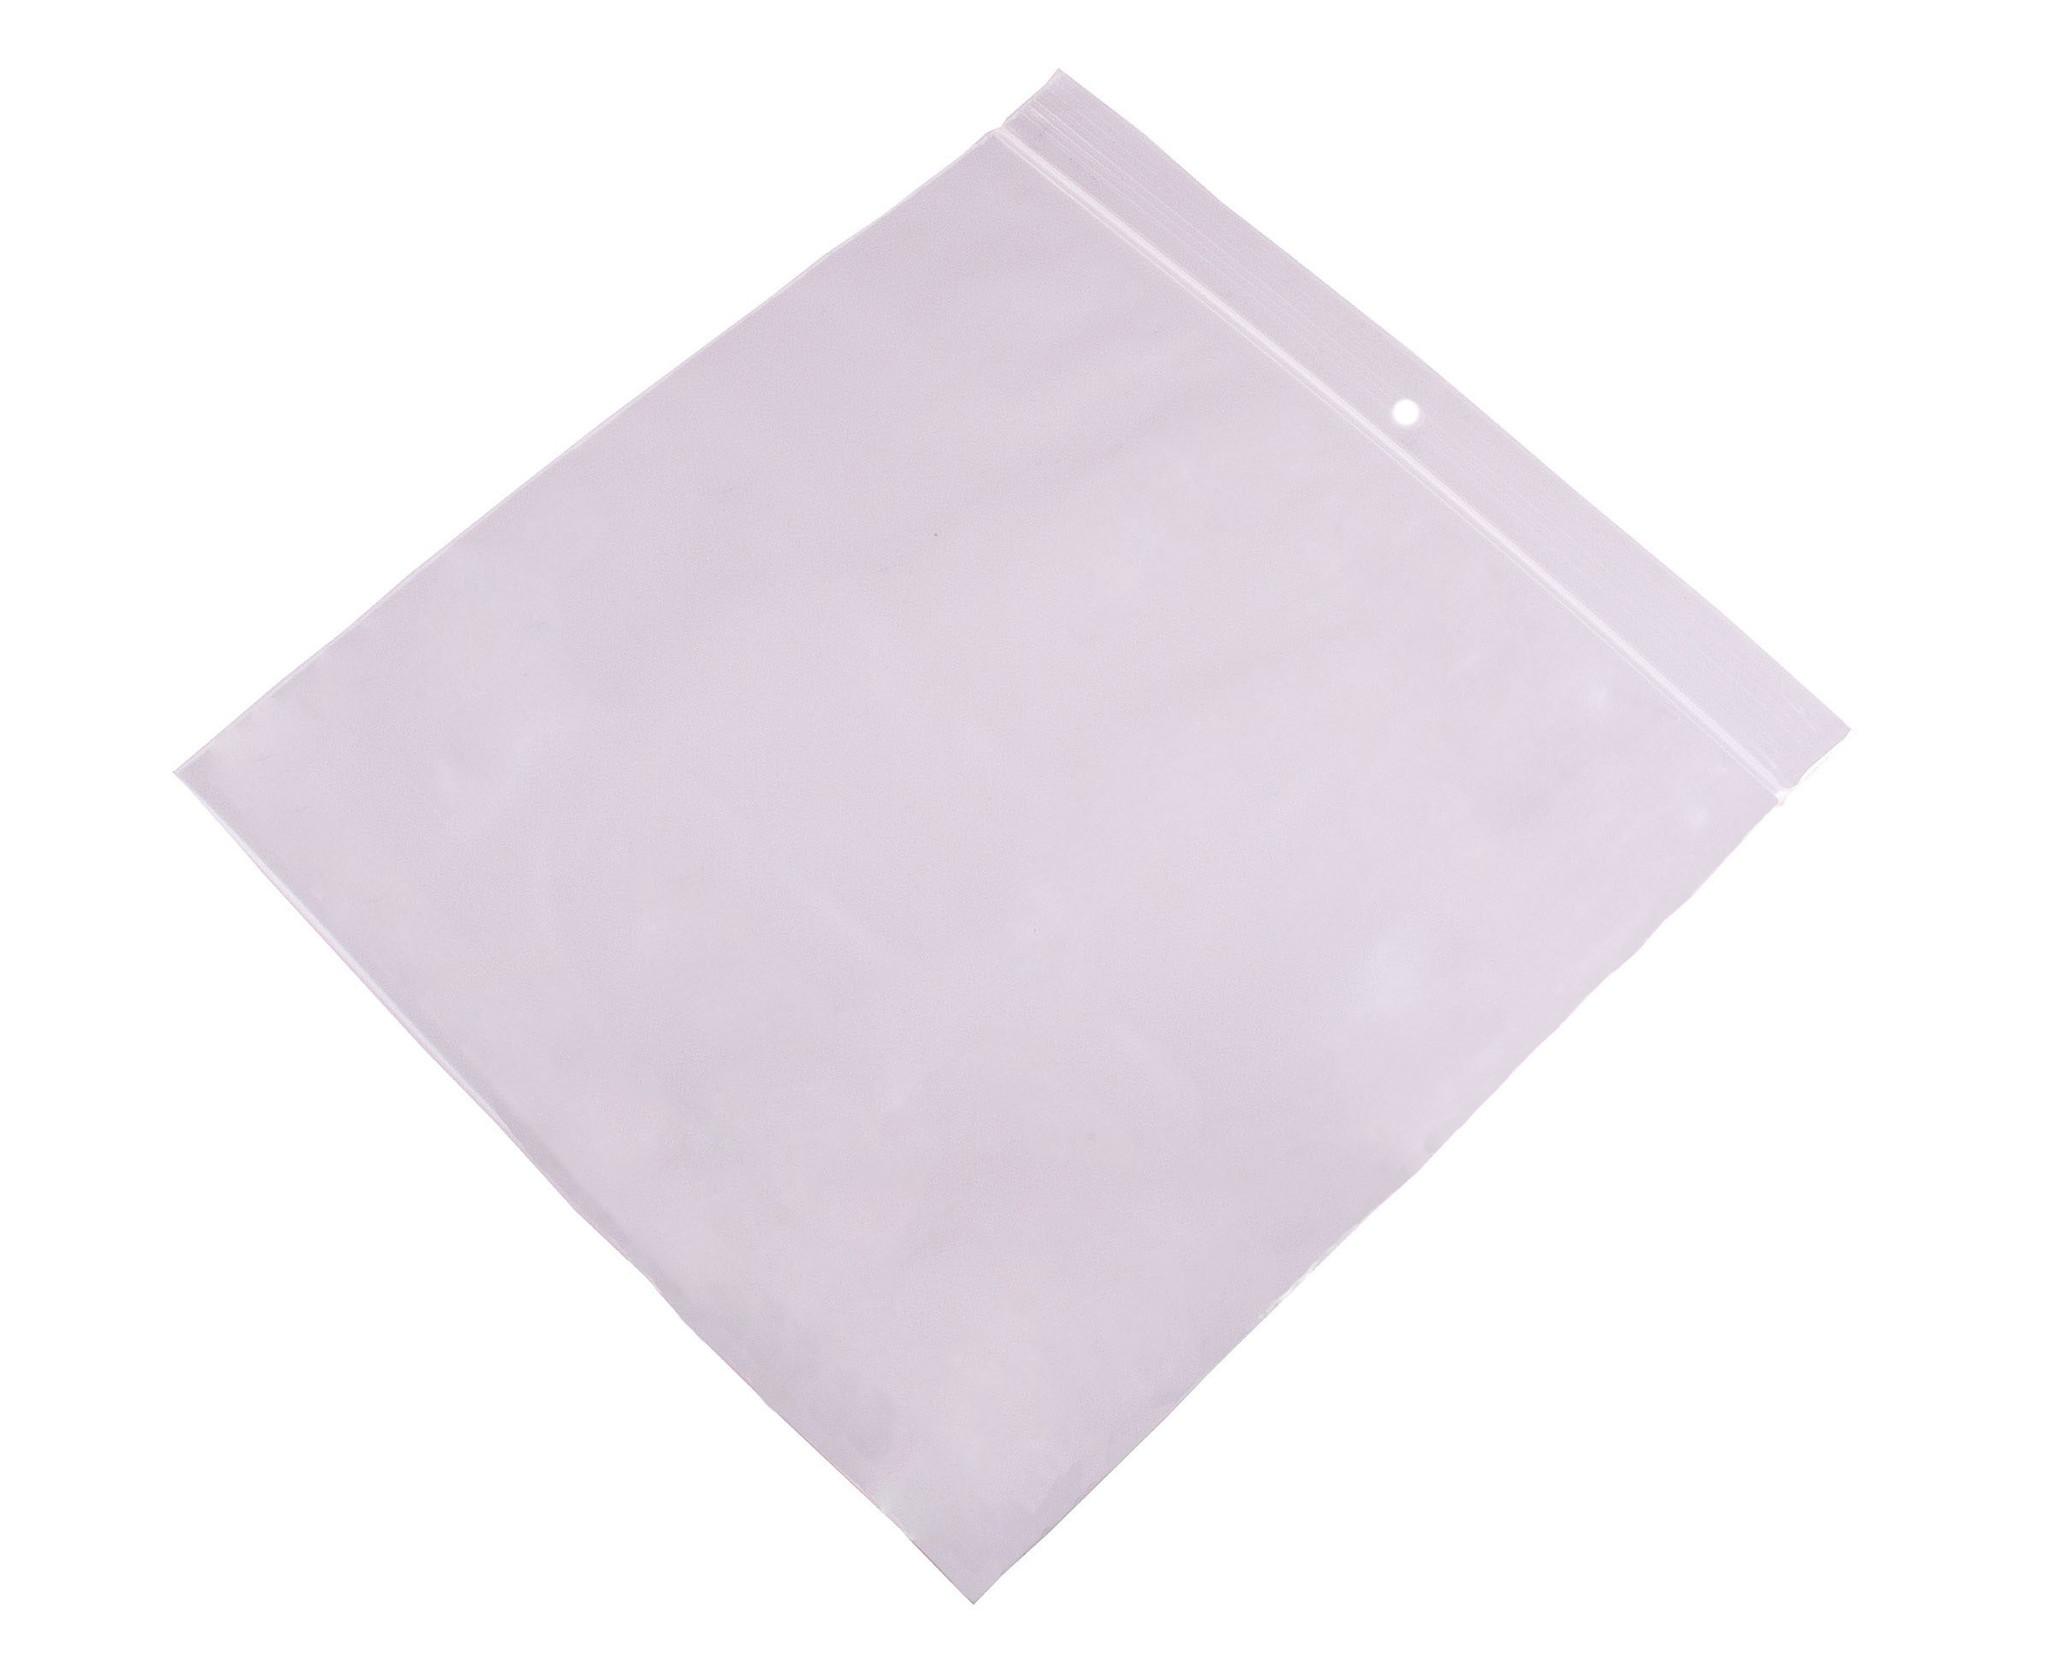 Gripzakken transparant extra sterk 400 x 400 mm uit 90 micron LDPE pakje van 100 stuks